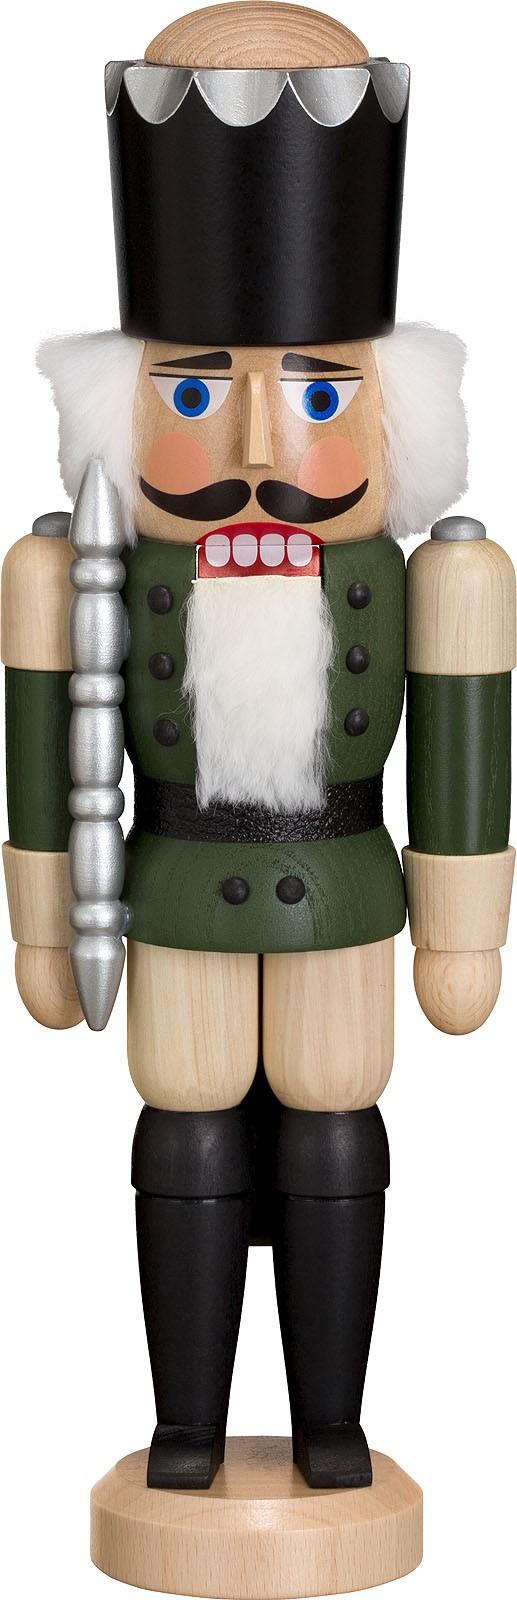 Nussknacker König, Esche lasiert, grün, 29 cm